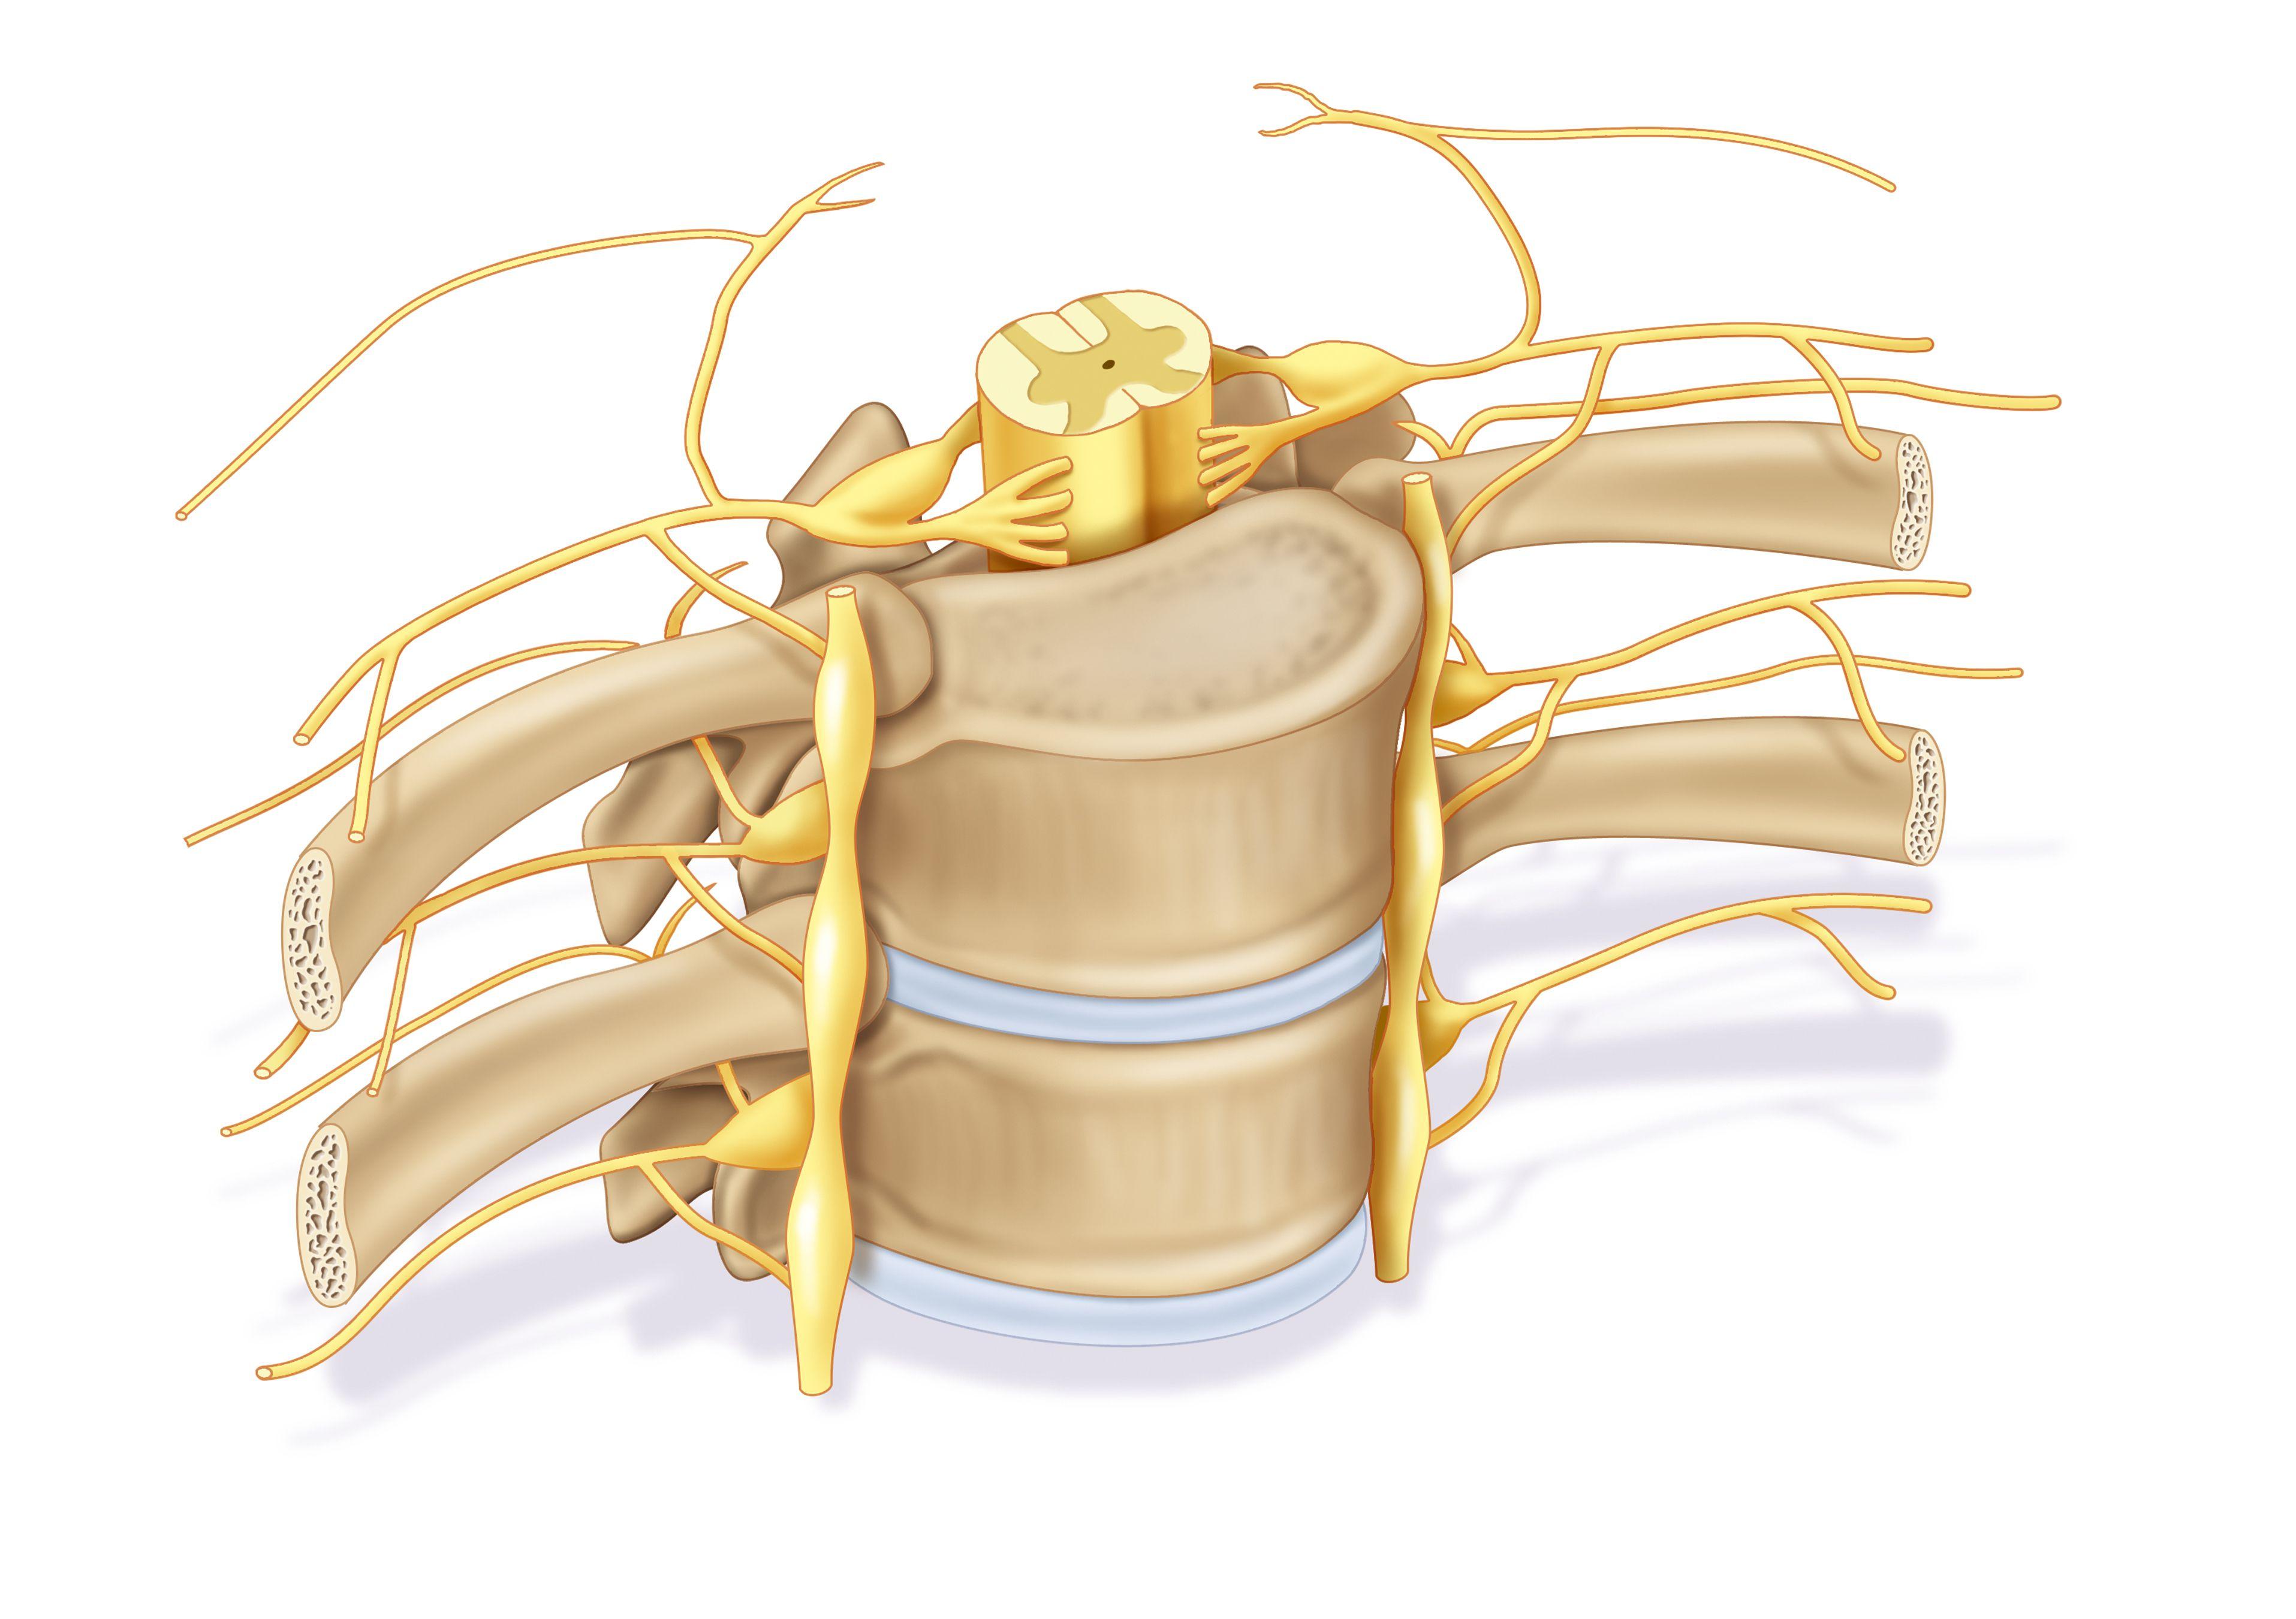 Spinal Nerve Root Definition